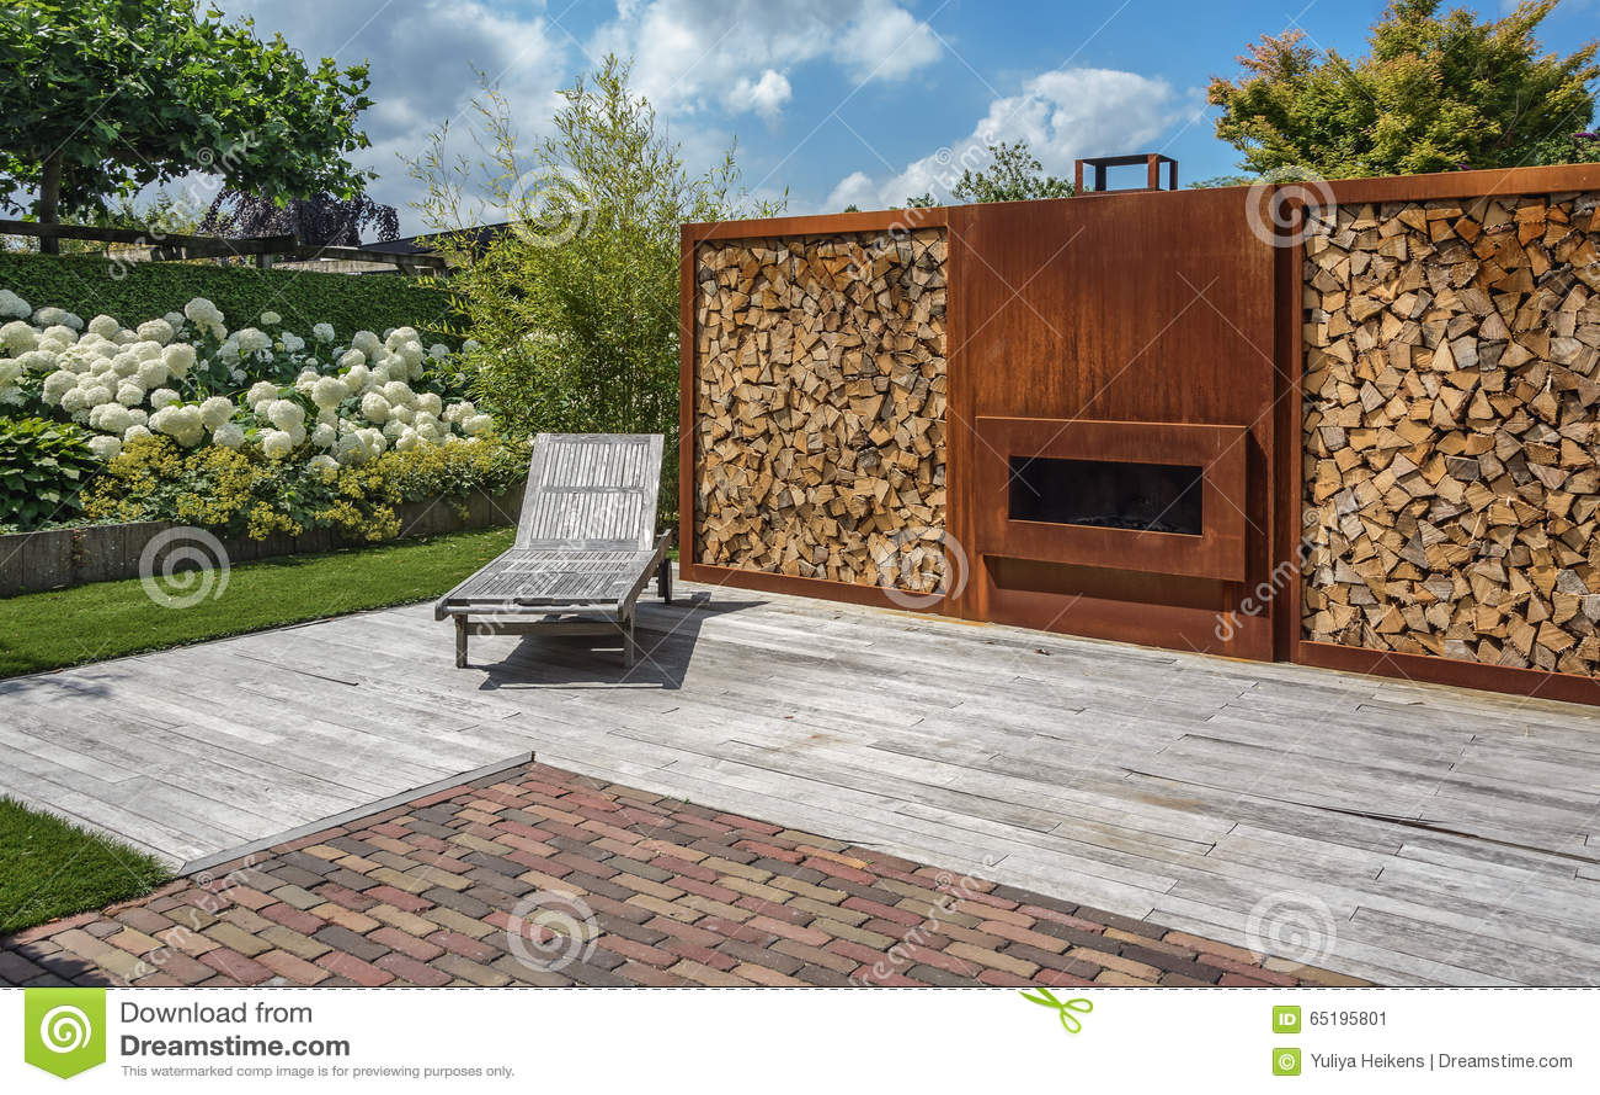 Neu Kamin Im Garten Stockfoto - Bild: 65195801 MJ76